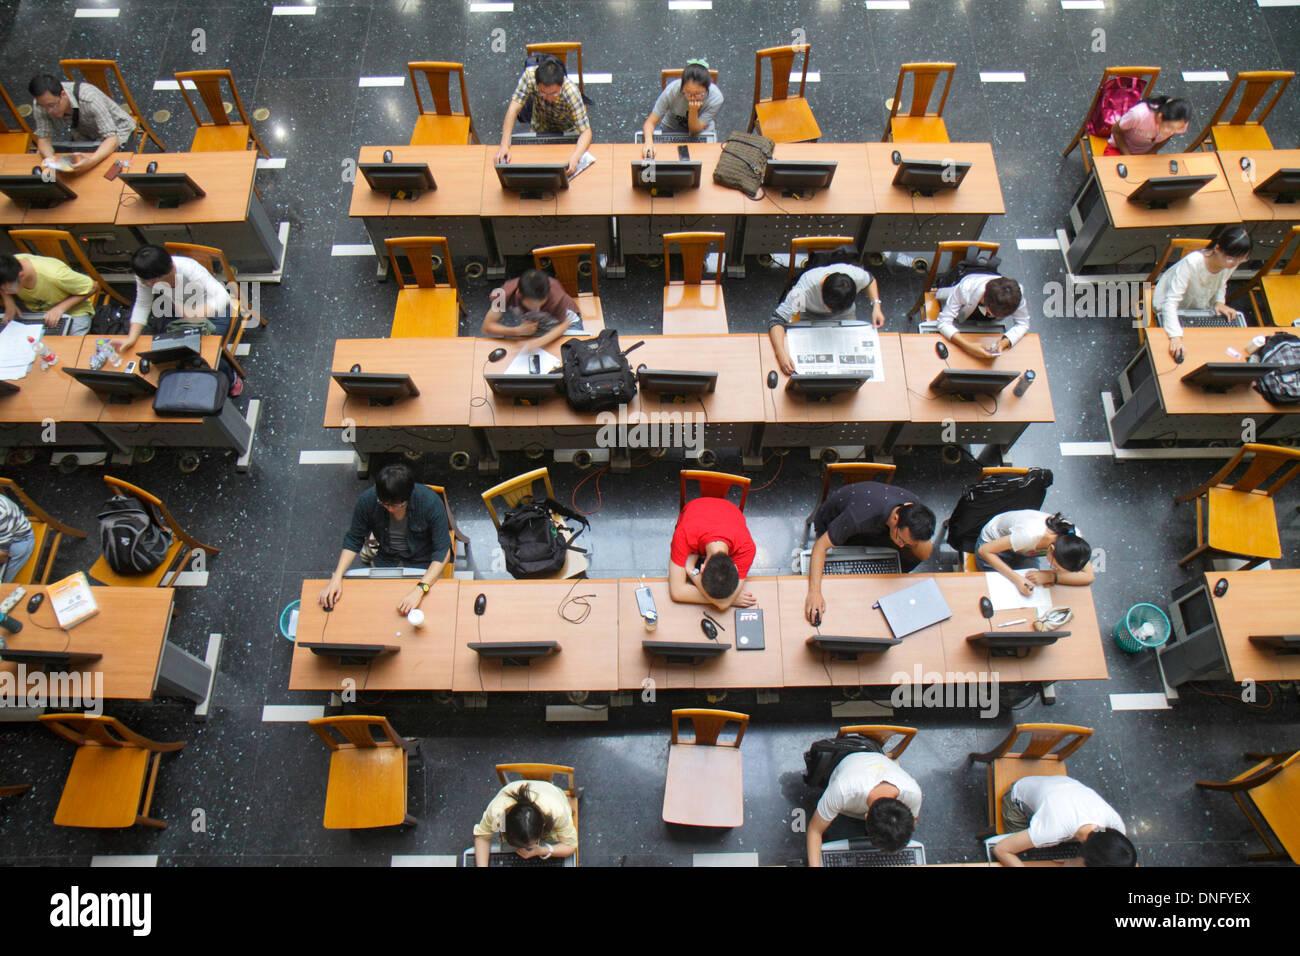 Peking China Haidian Bezirk Peking Universität PKU Beidà Higher Education Campus Bibliothek Studiensaal Computermonitoren Internet Stockbild